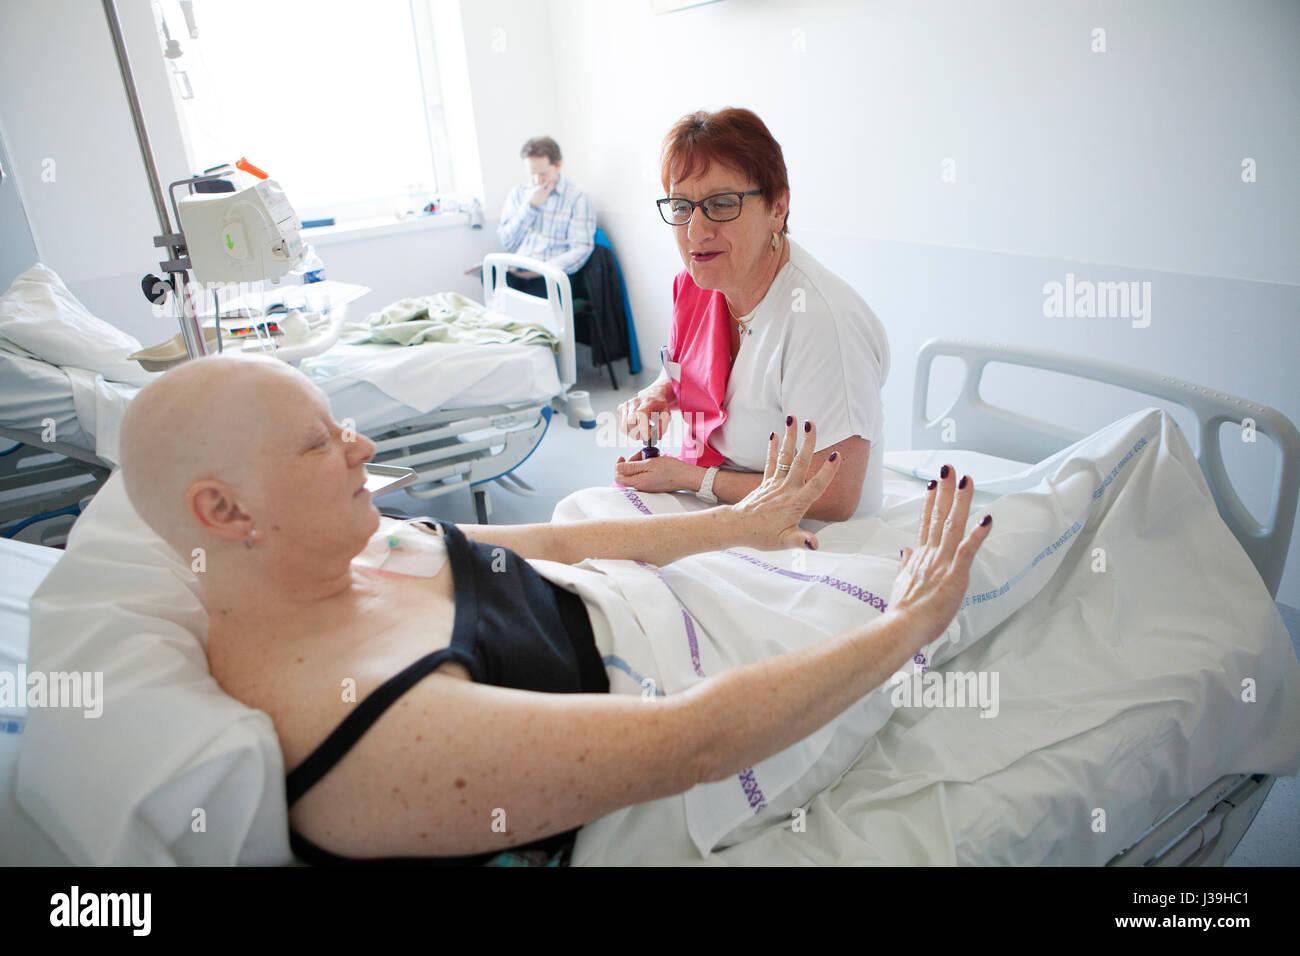 HOSPITAL BEAUTICIAN - Stock Image